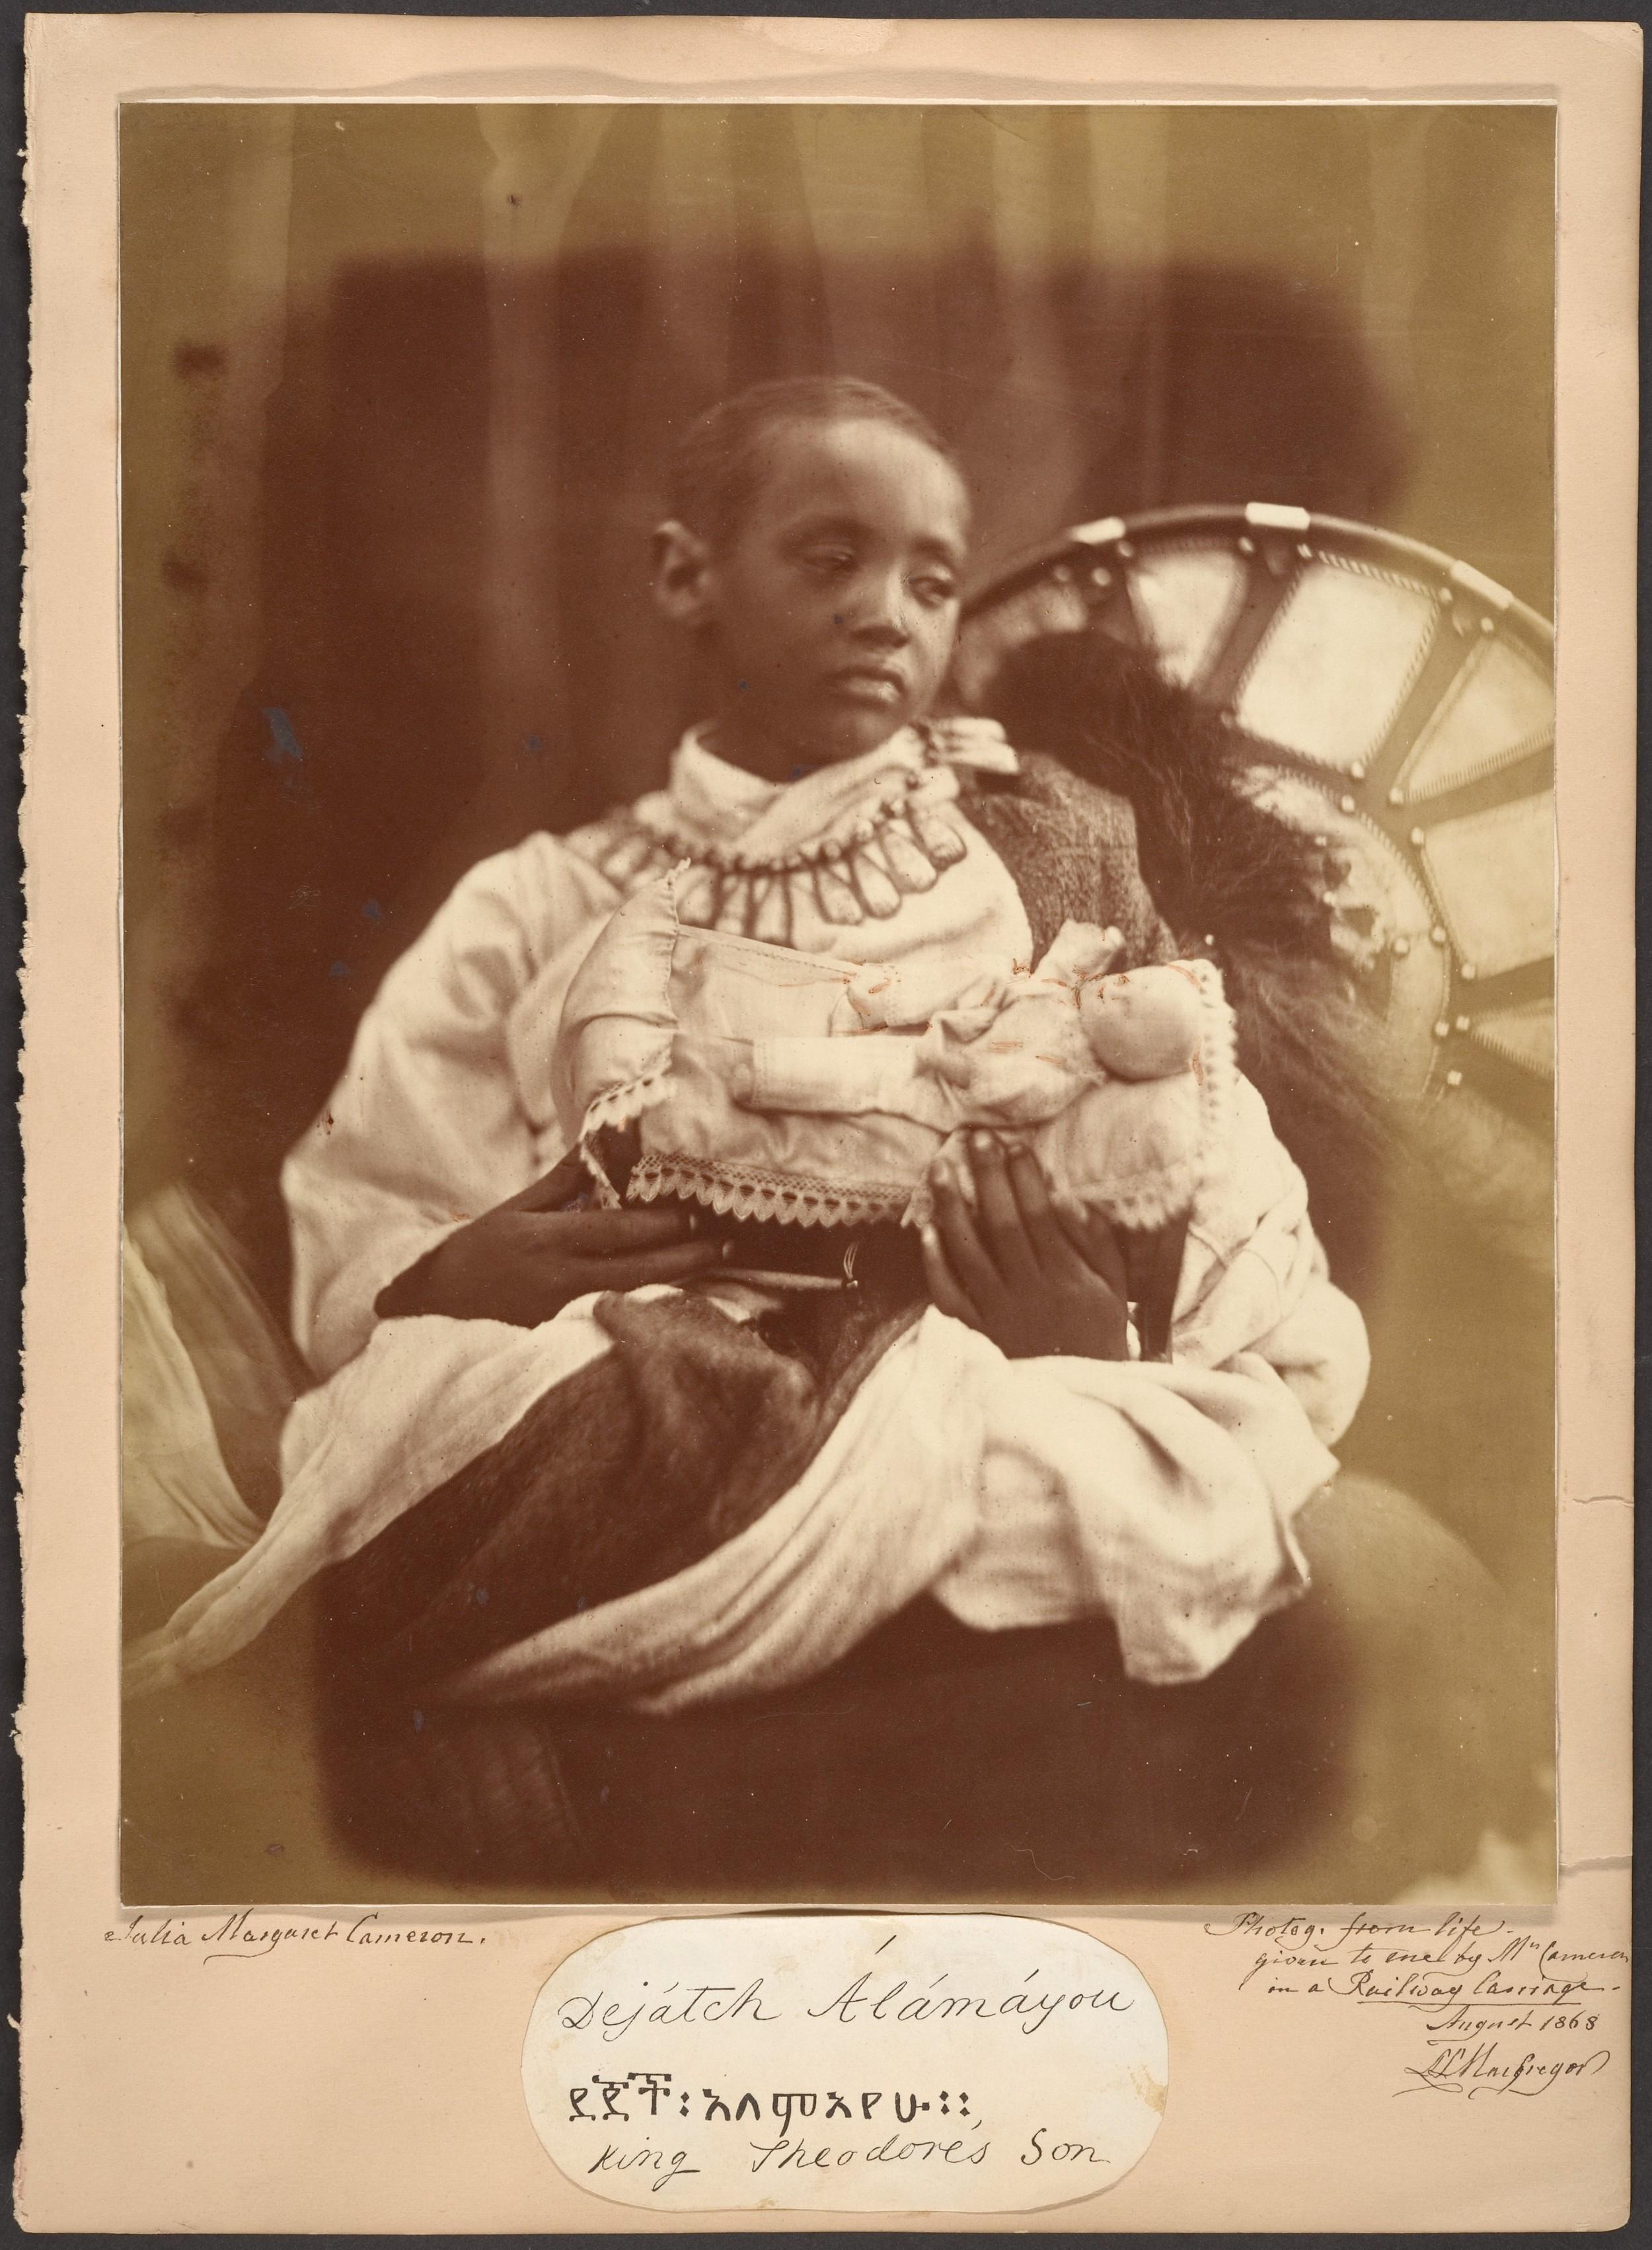 Déjatch Alamyaou, King Theodore's son / Julia Margaret Cameron / 1868 (credit: Metropolitan Museum of Art)